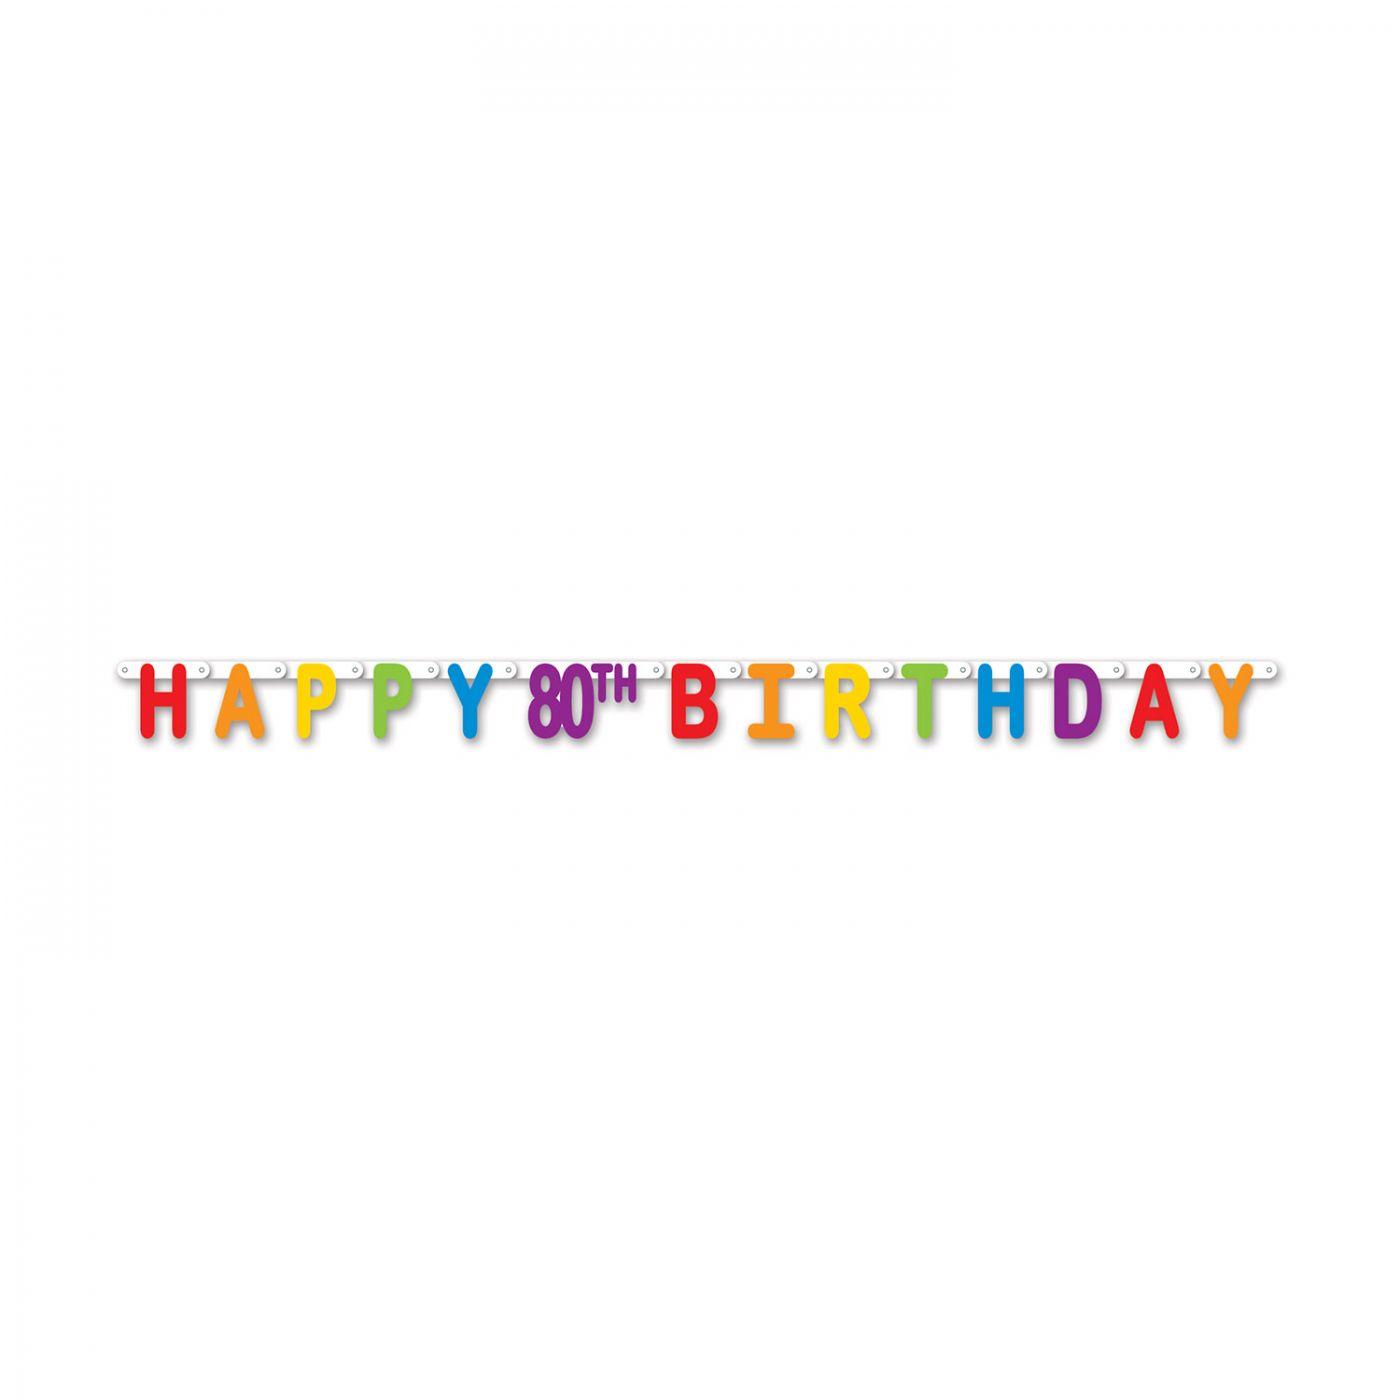 Happy 80th Birthday Streamer image